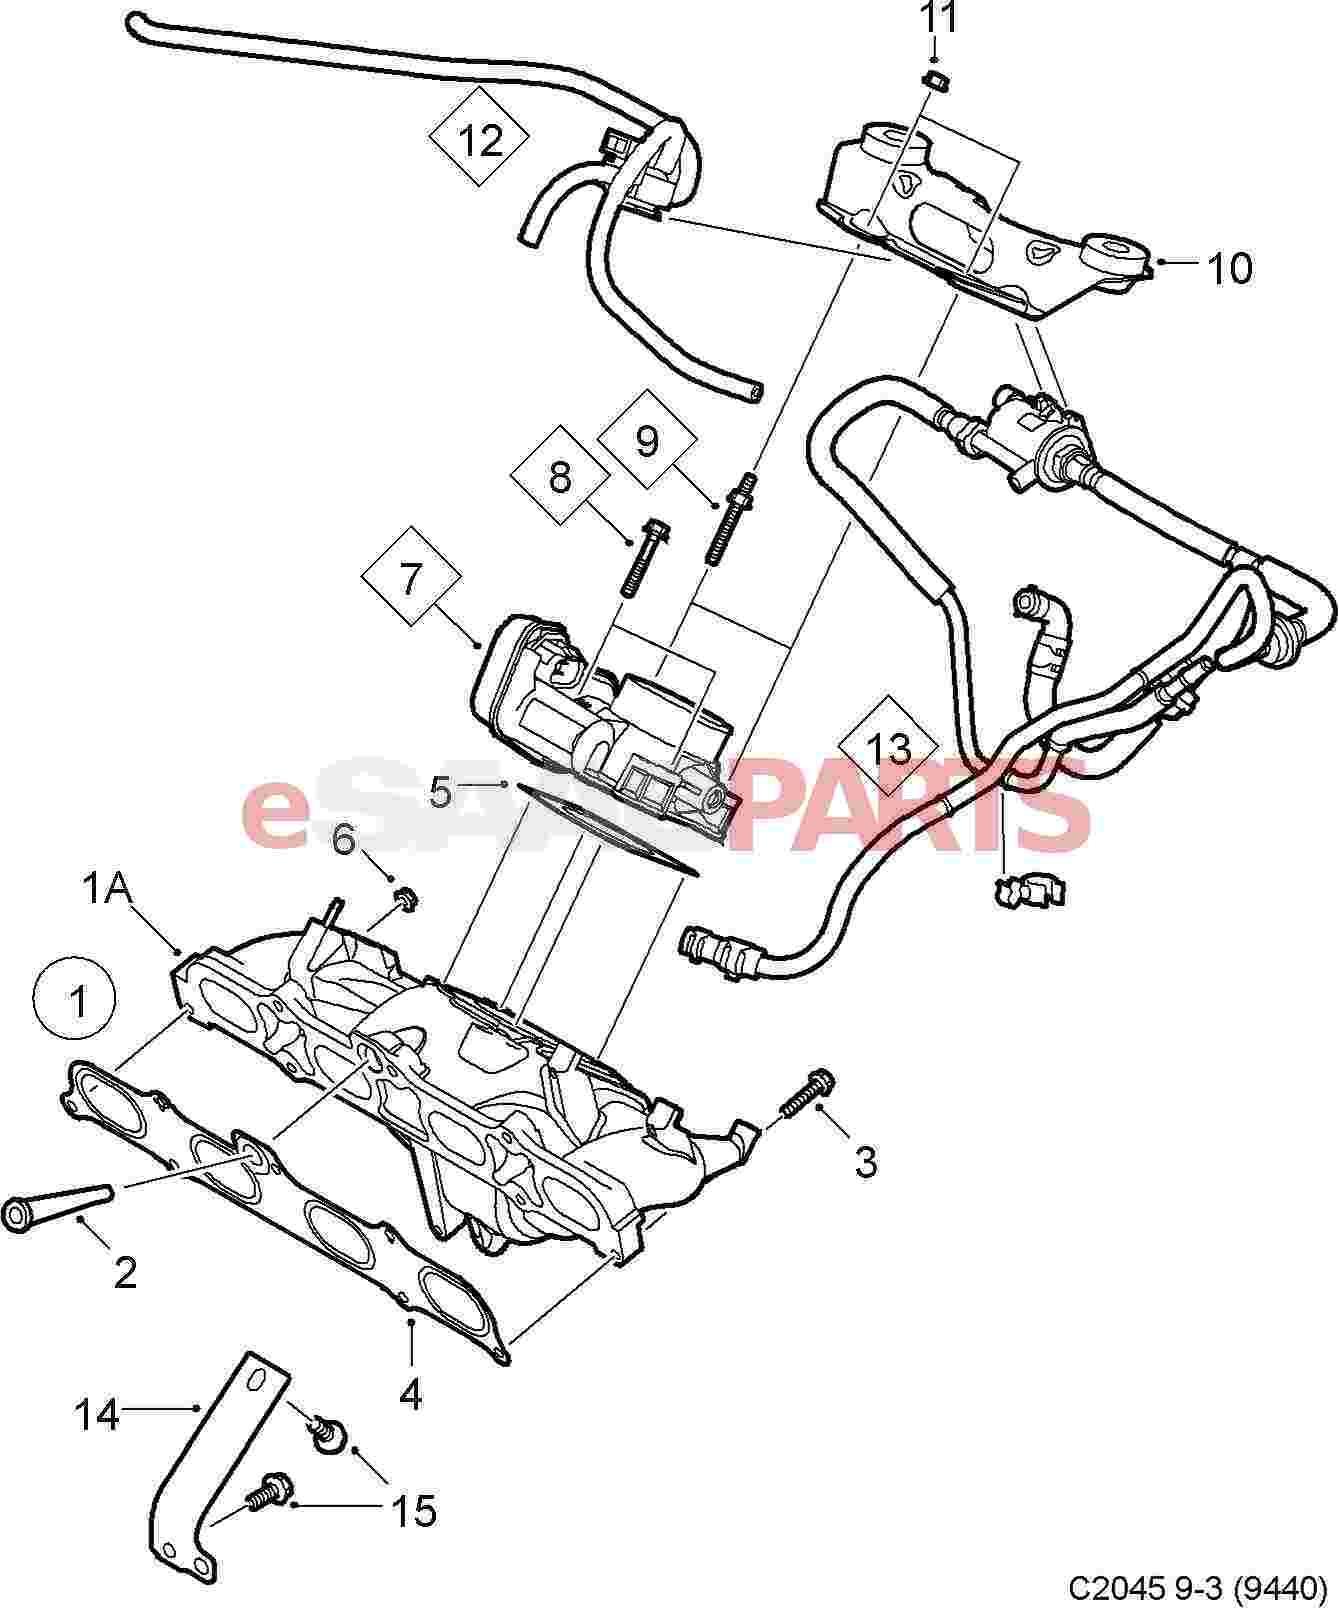 12786376  Saab Positive Crankcase Ventilation Valve